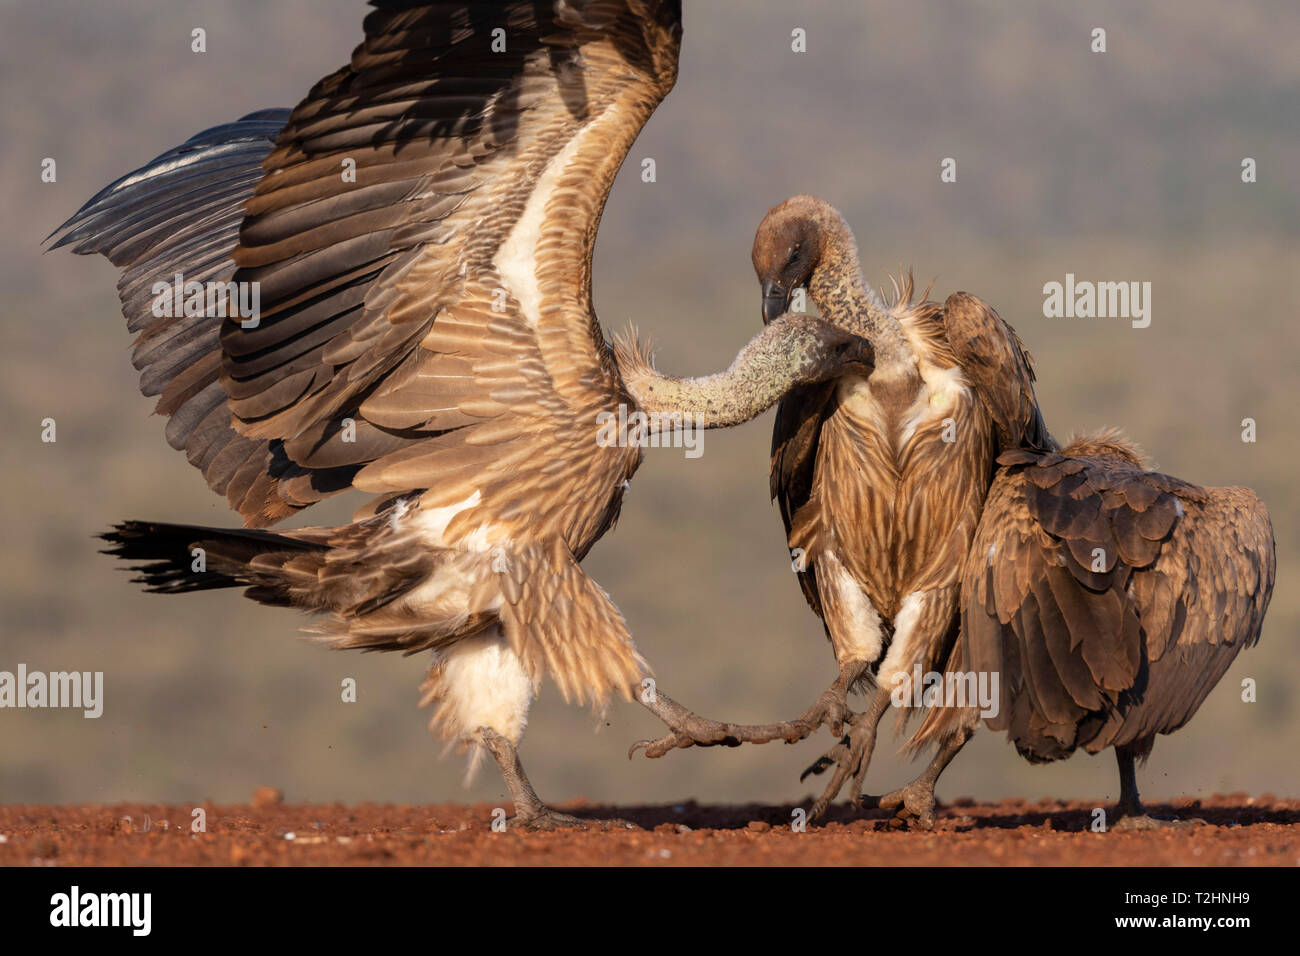 Weiß gesichert Geier, Tylose in Africanus, in Konfrontation, Zimanga Private Game Reserve, KwaZulu-Natal, Südafrika Stockbild